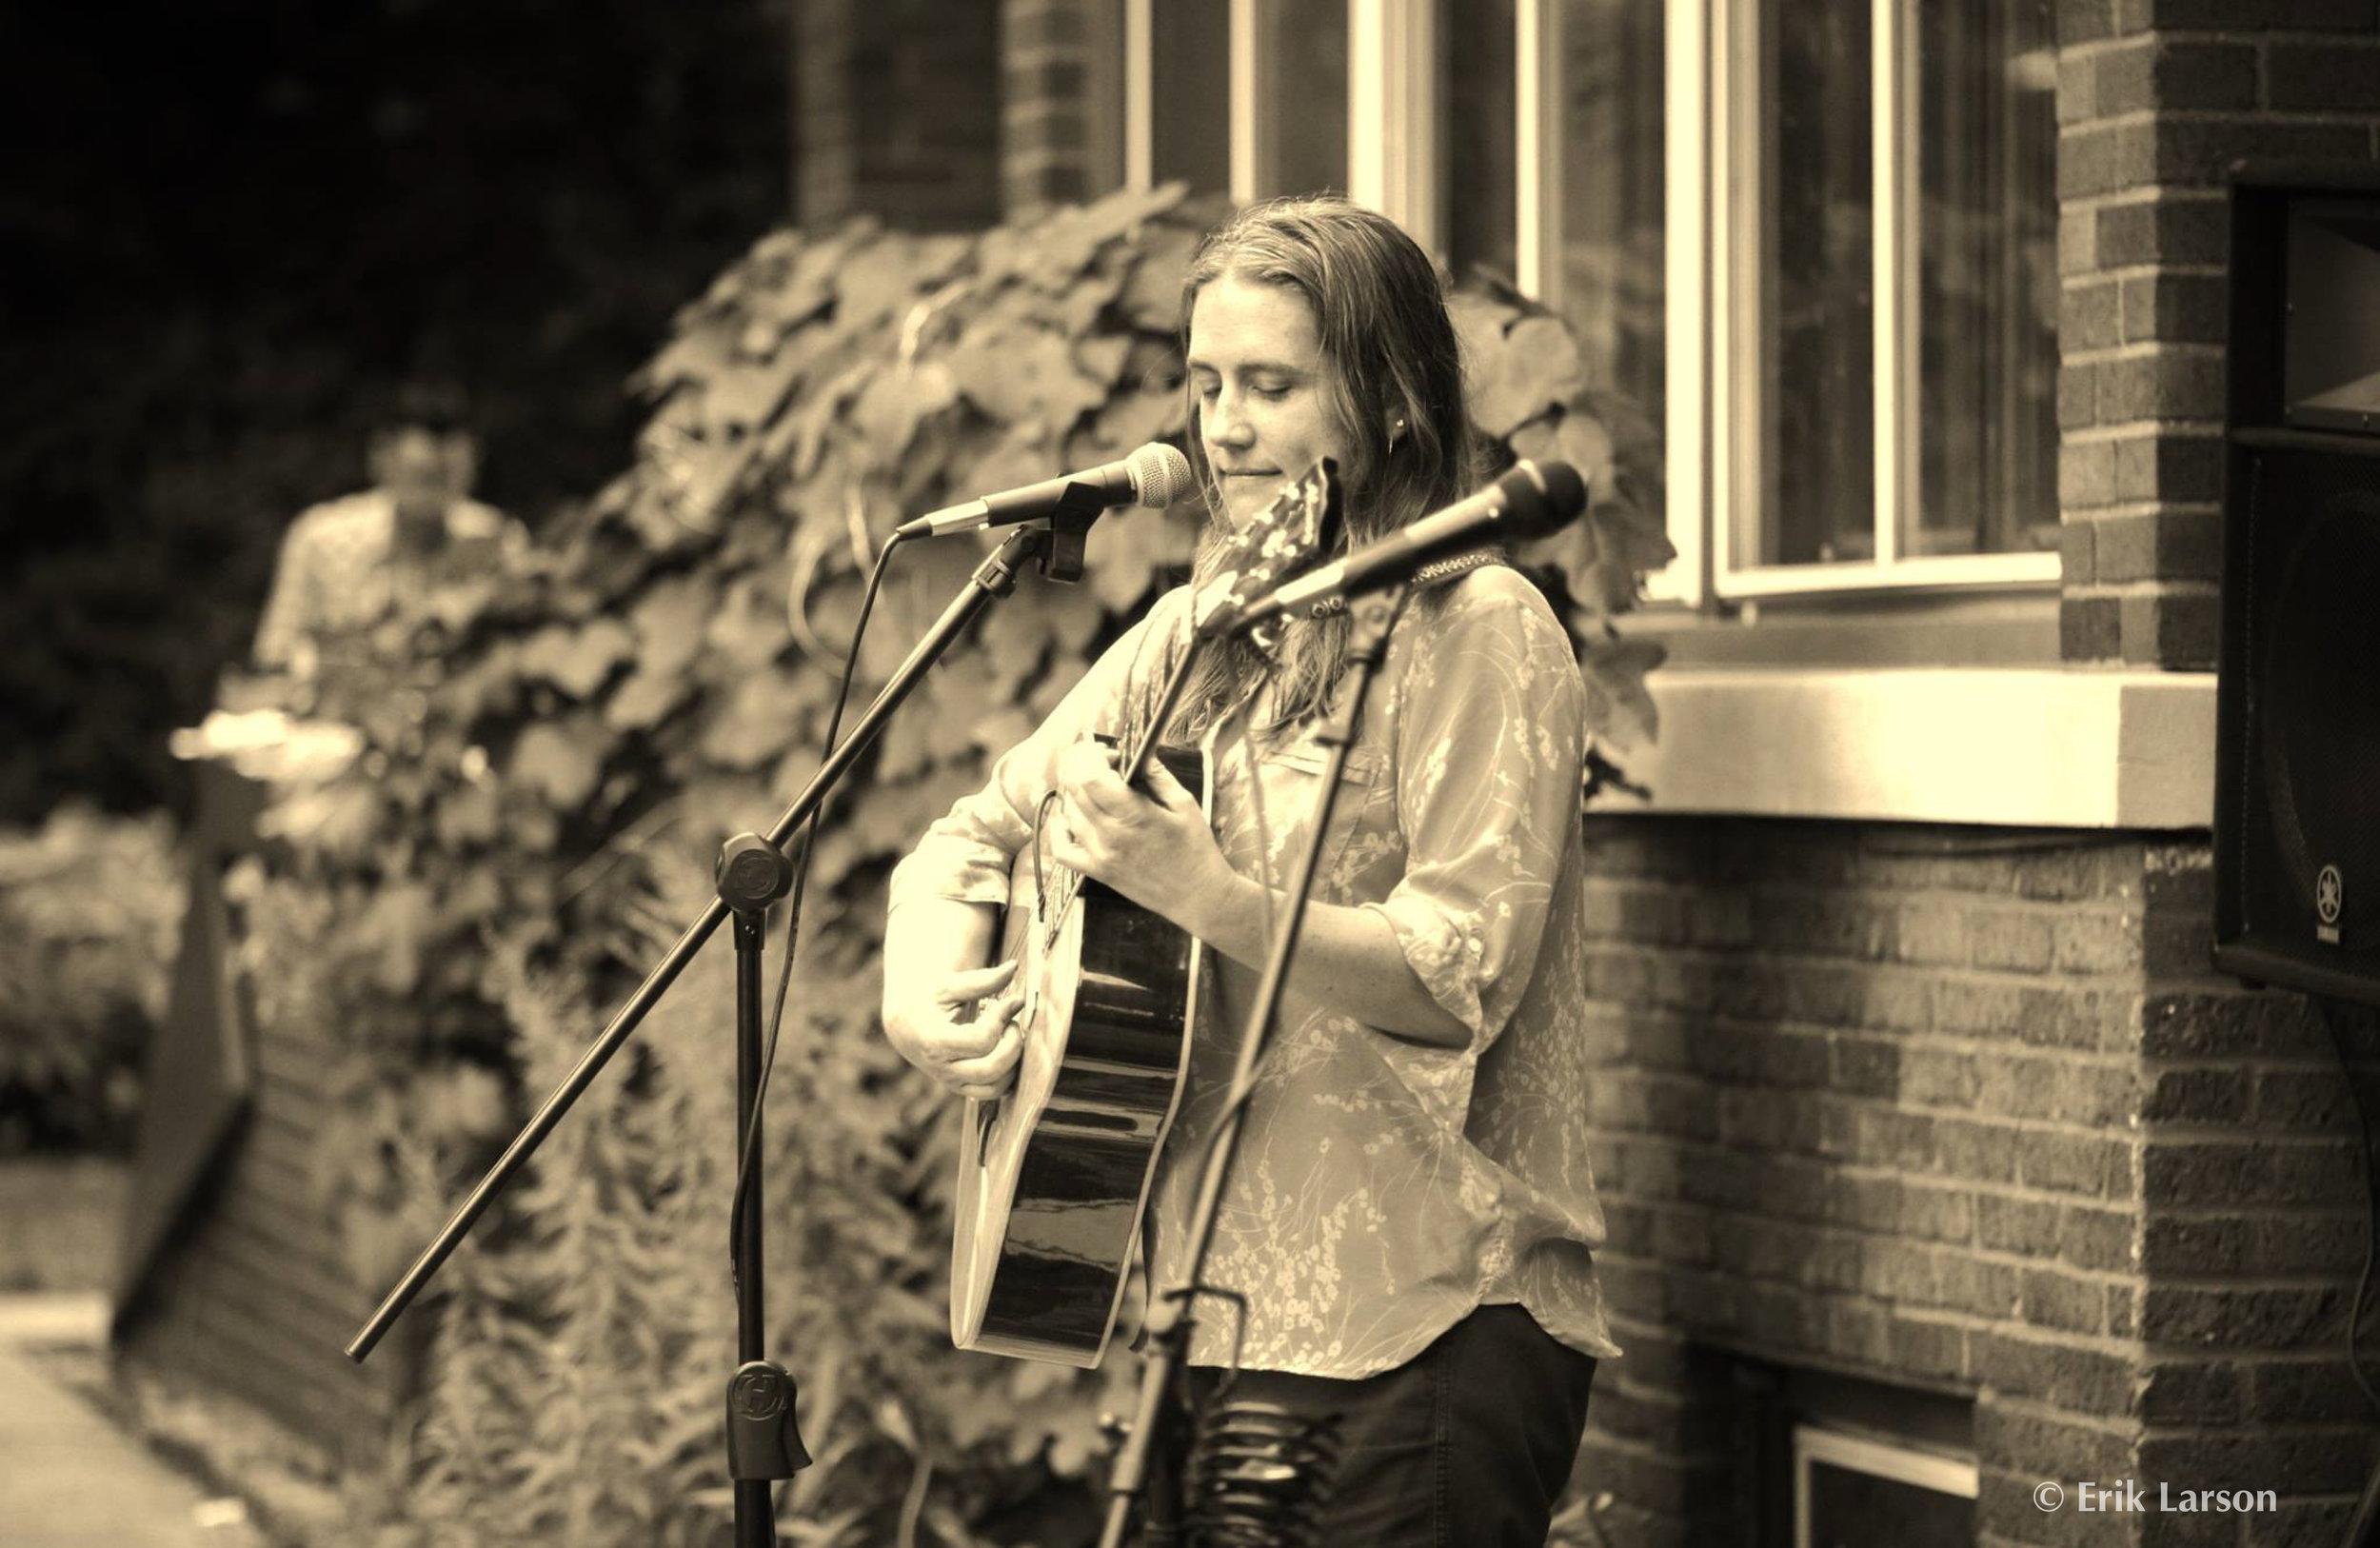 2016 Jennifer Levenhagen, Acoustics in the Sun at Squalid Manor, photo by Erik Larson (c).jpg